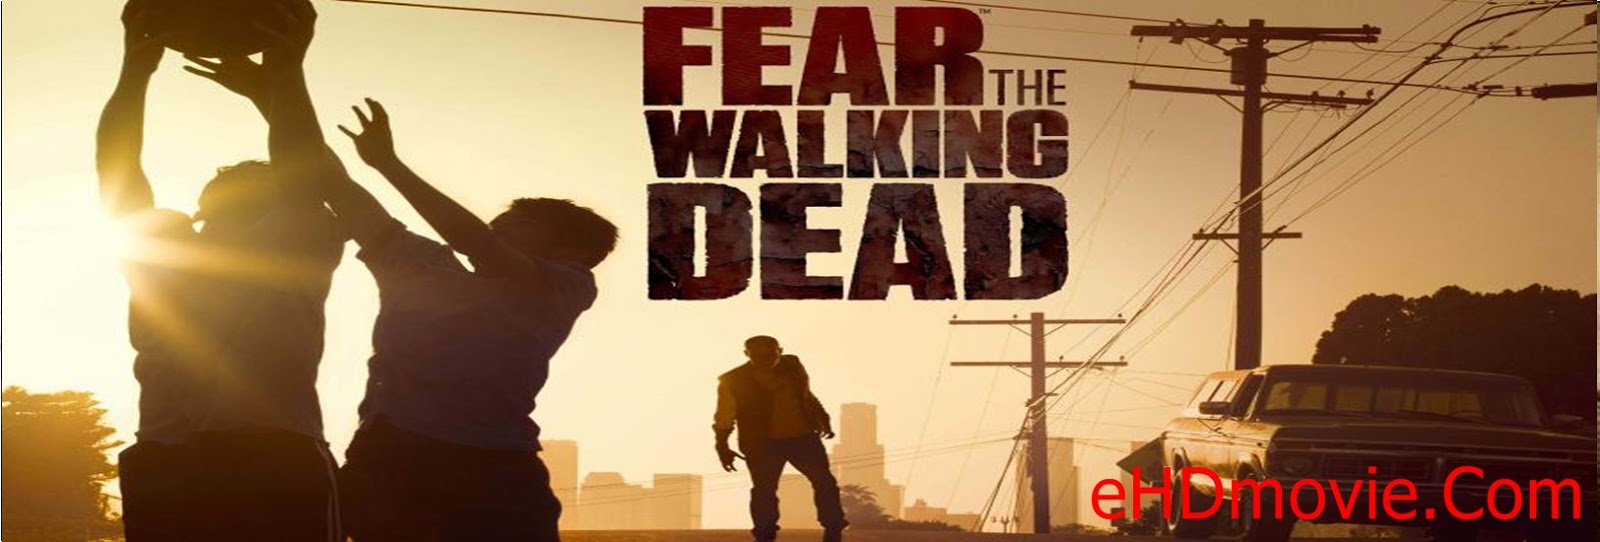 Fear The Walking Dead Season 1 Complete Dual Audio 720p BRRip [Hindi – English] ESubs